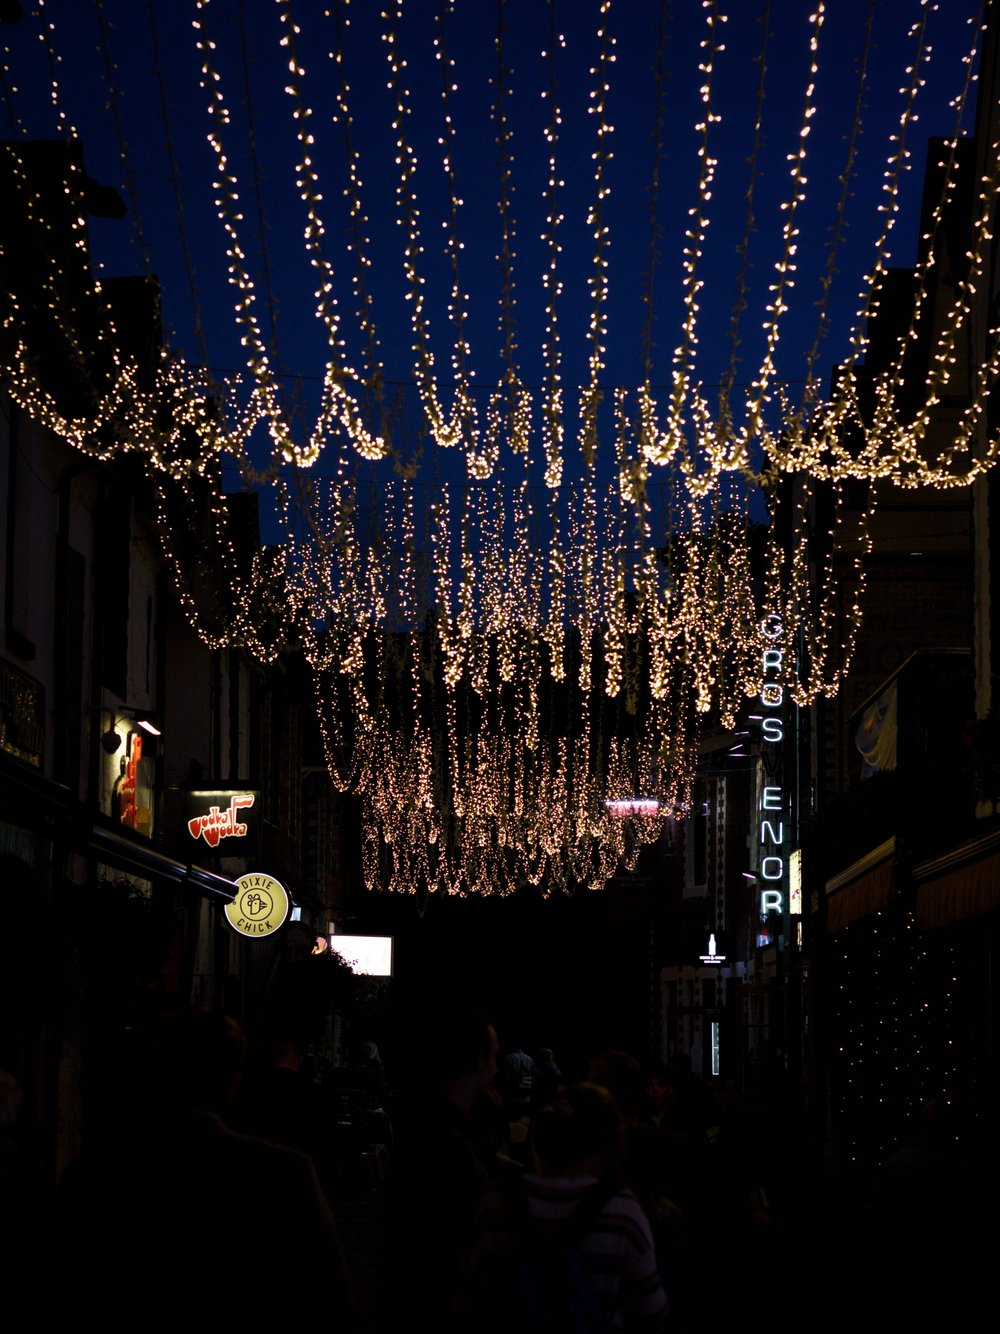 26th August - beautiful lights in Ashton Lane (on the same night we met Jeremy Corbyn in Zizzi!)